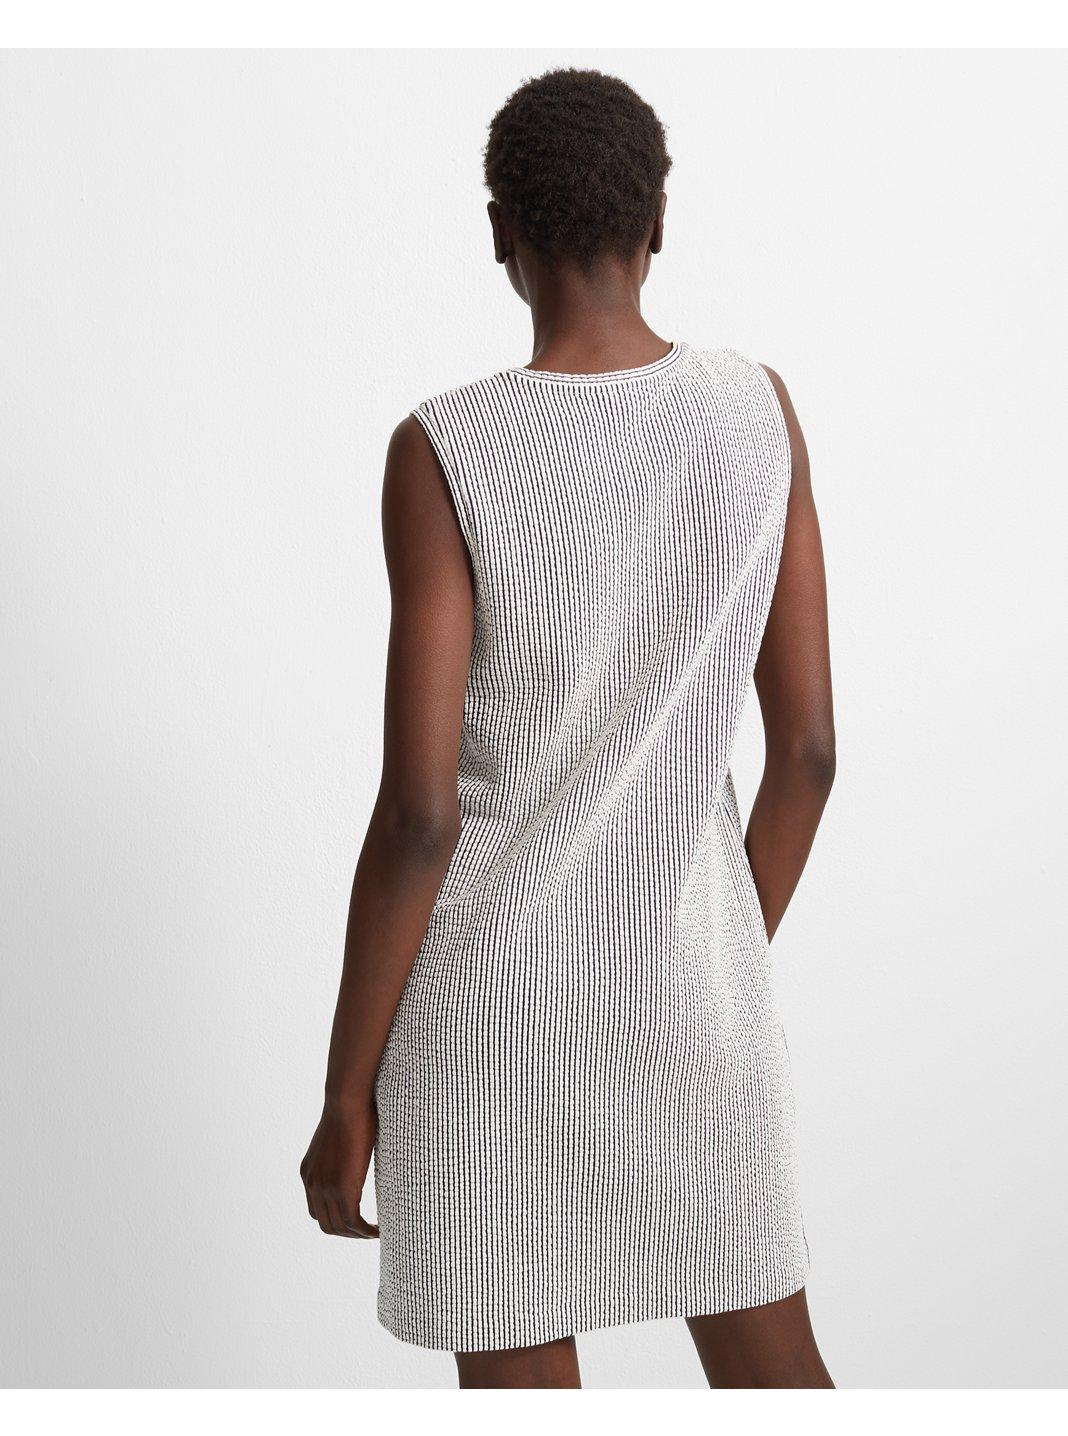 aea0d4181cfd2 Womens Dresses | Club Monaco